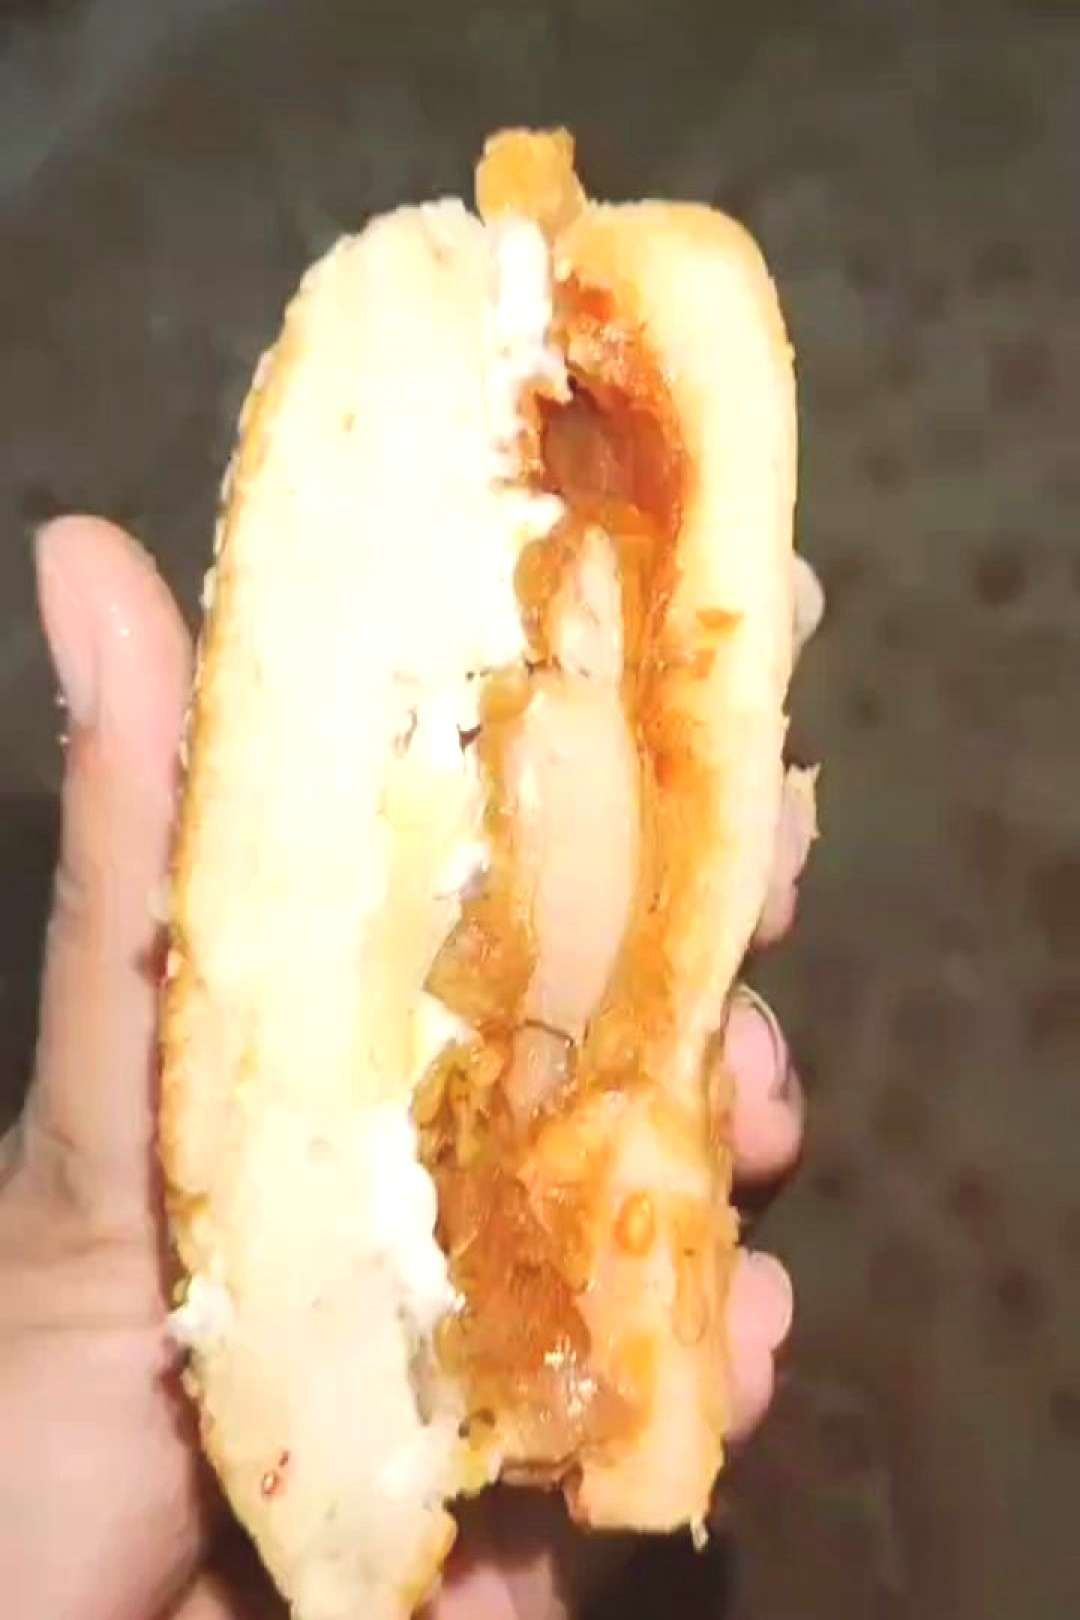 #cheeseburgers #location #chicken #zinger #burger #taste #best #feel #it #15 #d #3 Best Chicken Zinger Burger . Taste it, feel it . Location: 15 d 3You can find Cheeseburgers and more on our website.Best Chicken Zinger Burger . T...